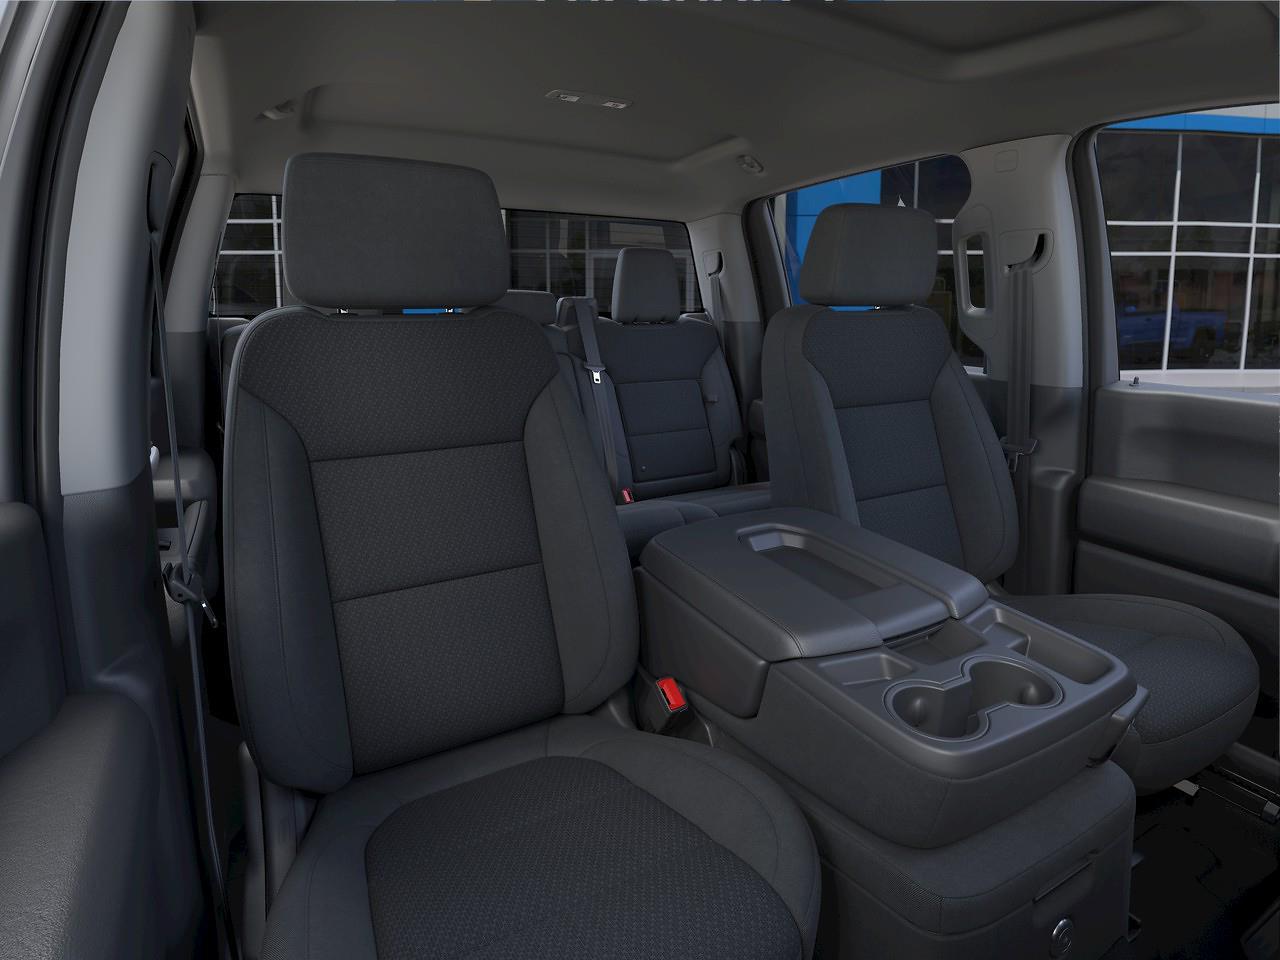 2021 Chevrolet Silverado 2500 Crew Cab 4x4, Pickup #Q210455 - photo 13